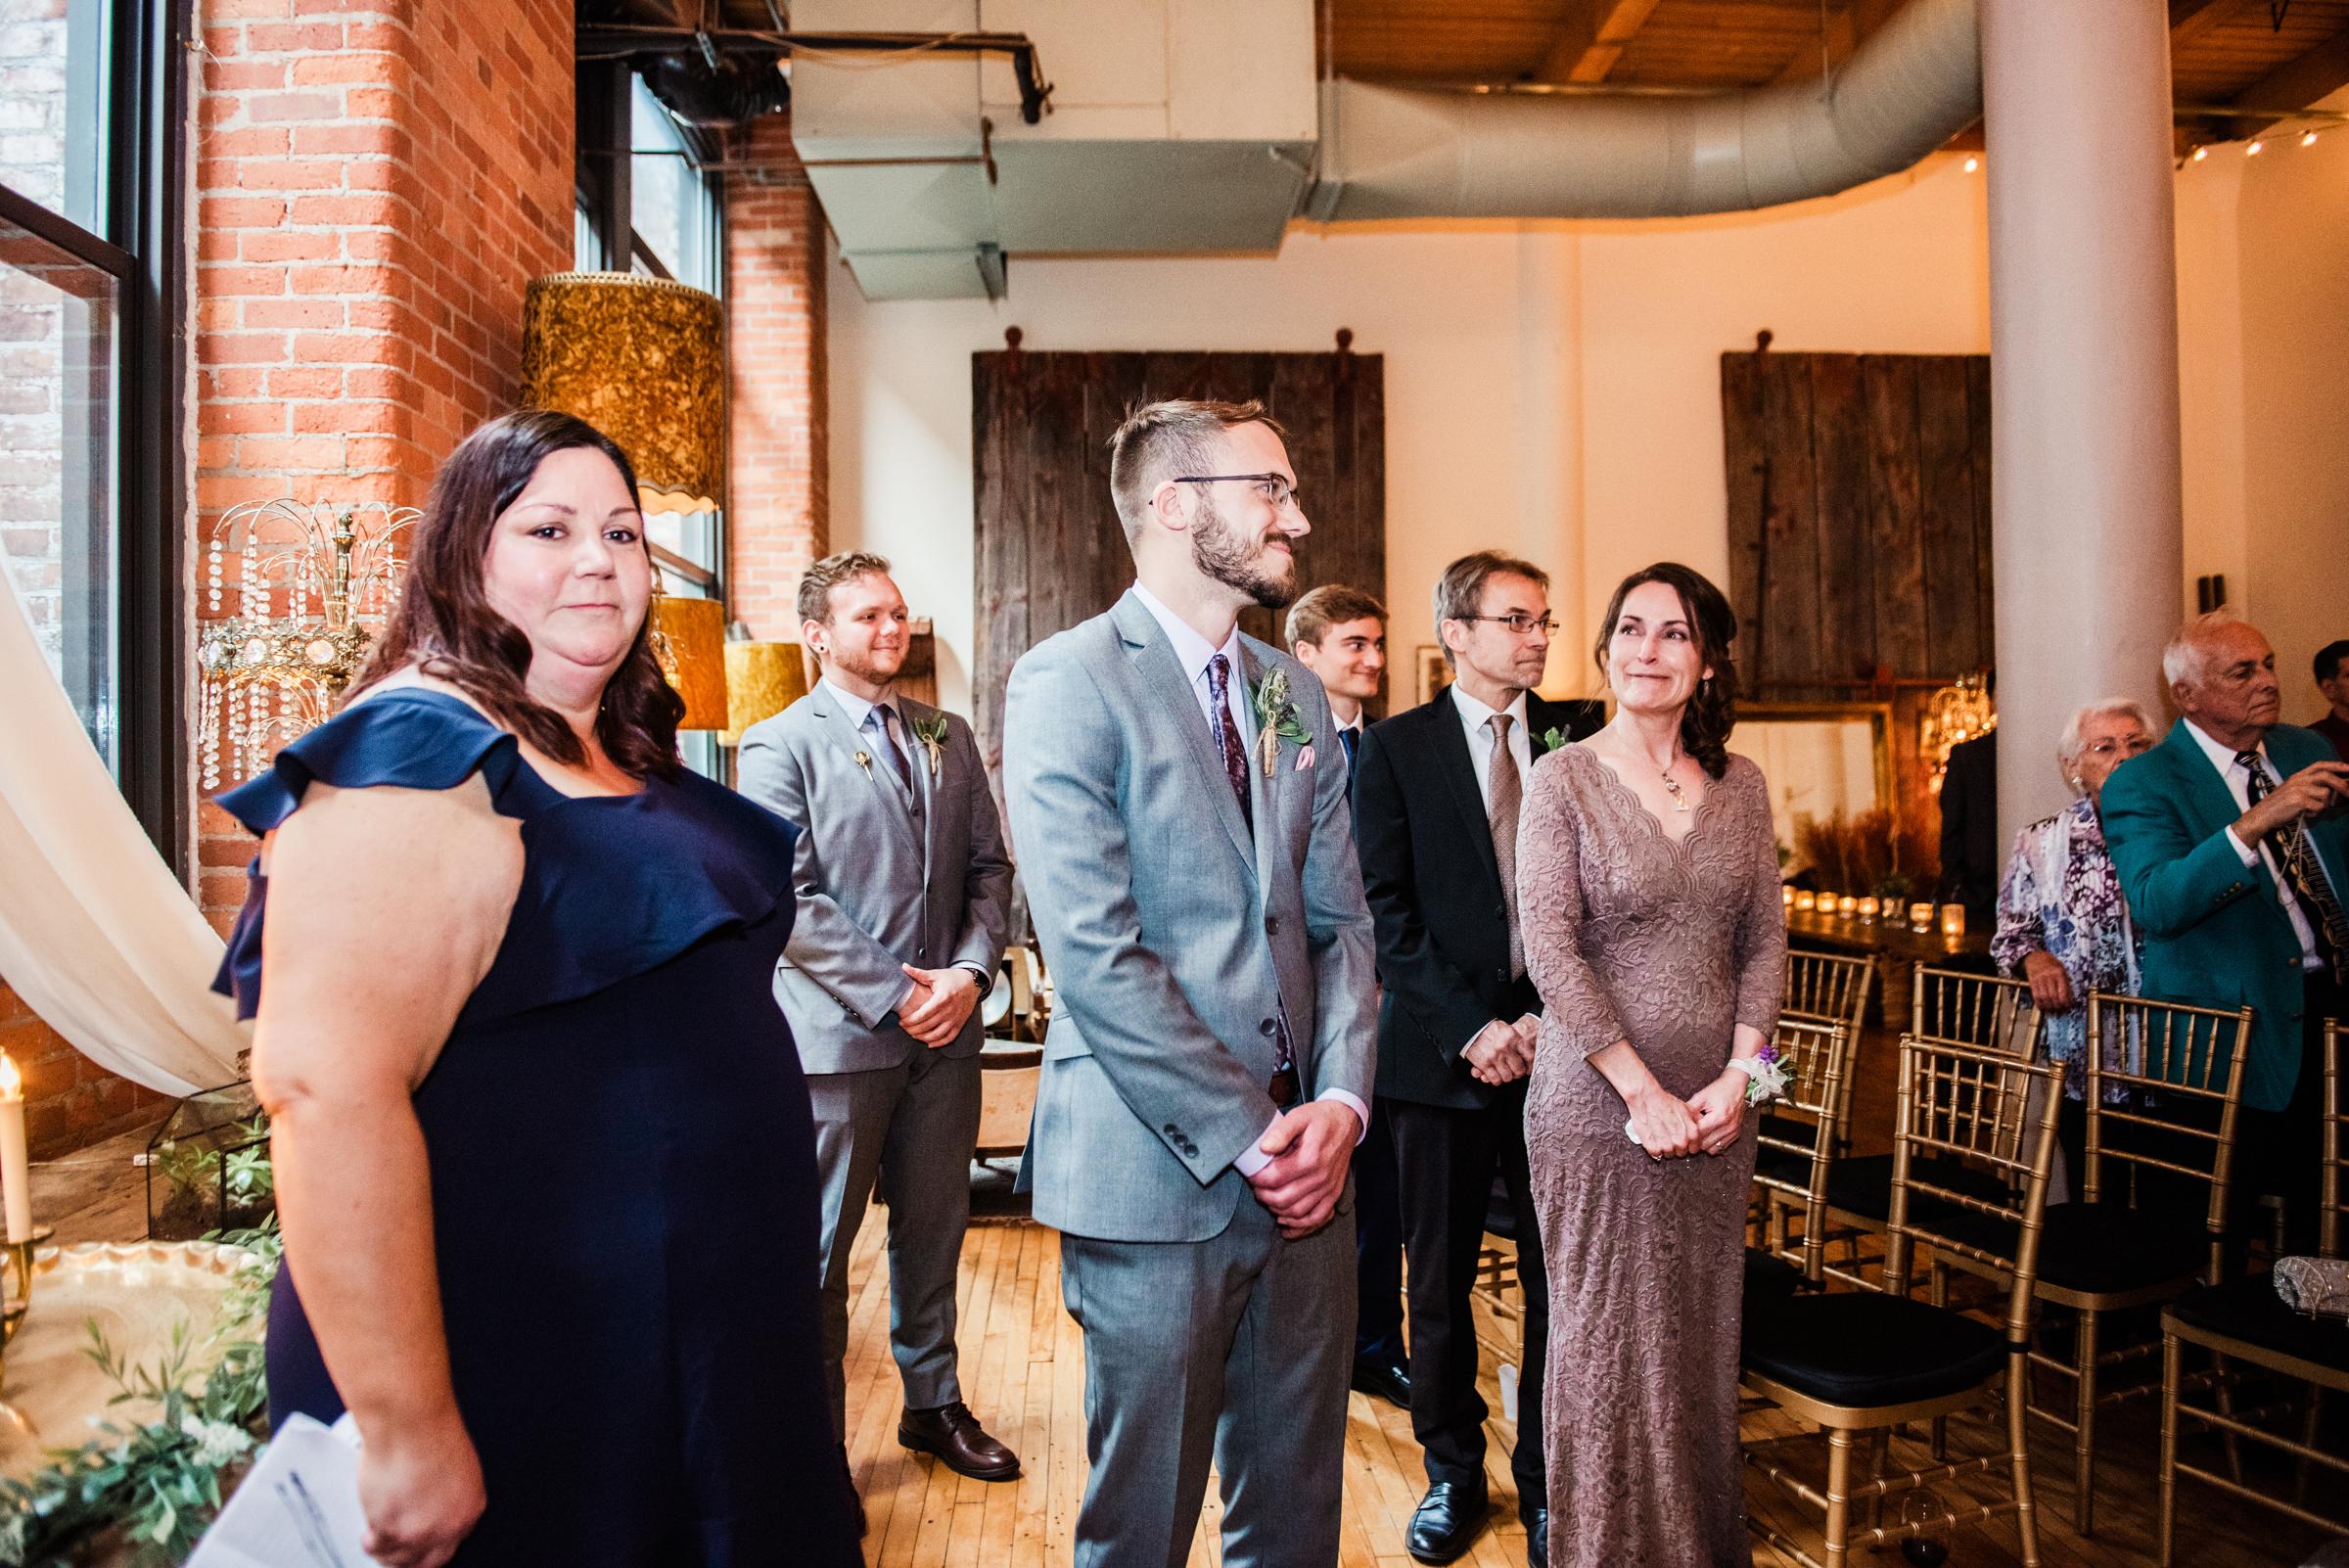 Studio_180_Lamberton_Conservatory_Rochester_Wedding_JILL_STUDIO_Rochester_NY_Photographer_DSC_8898.jpg